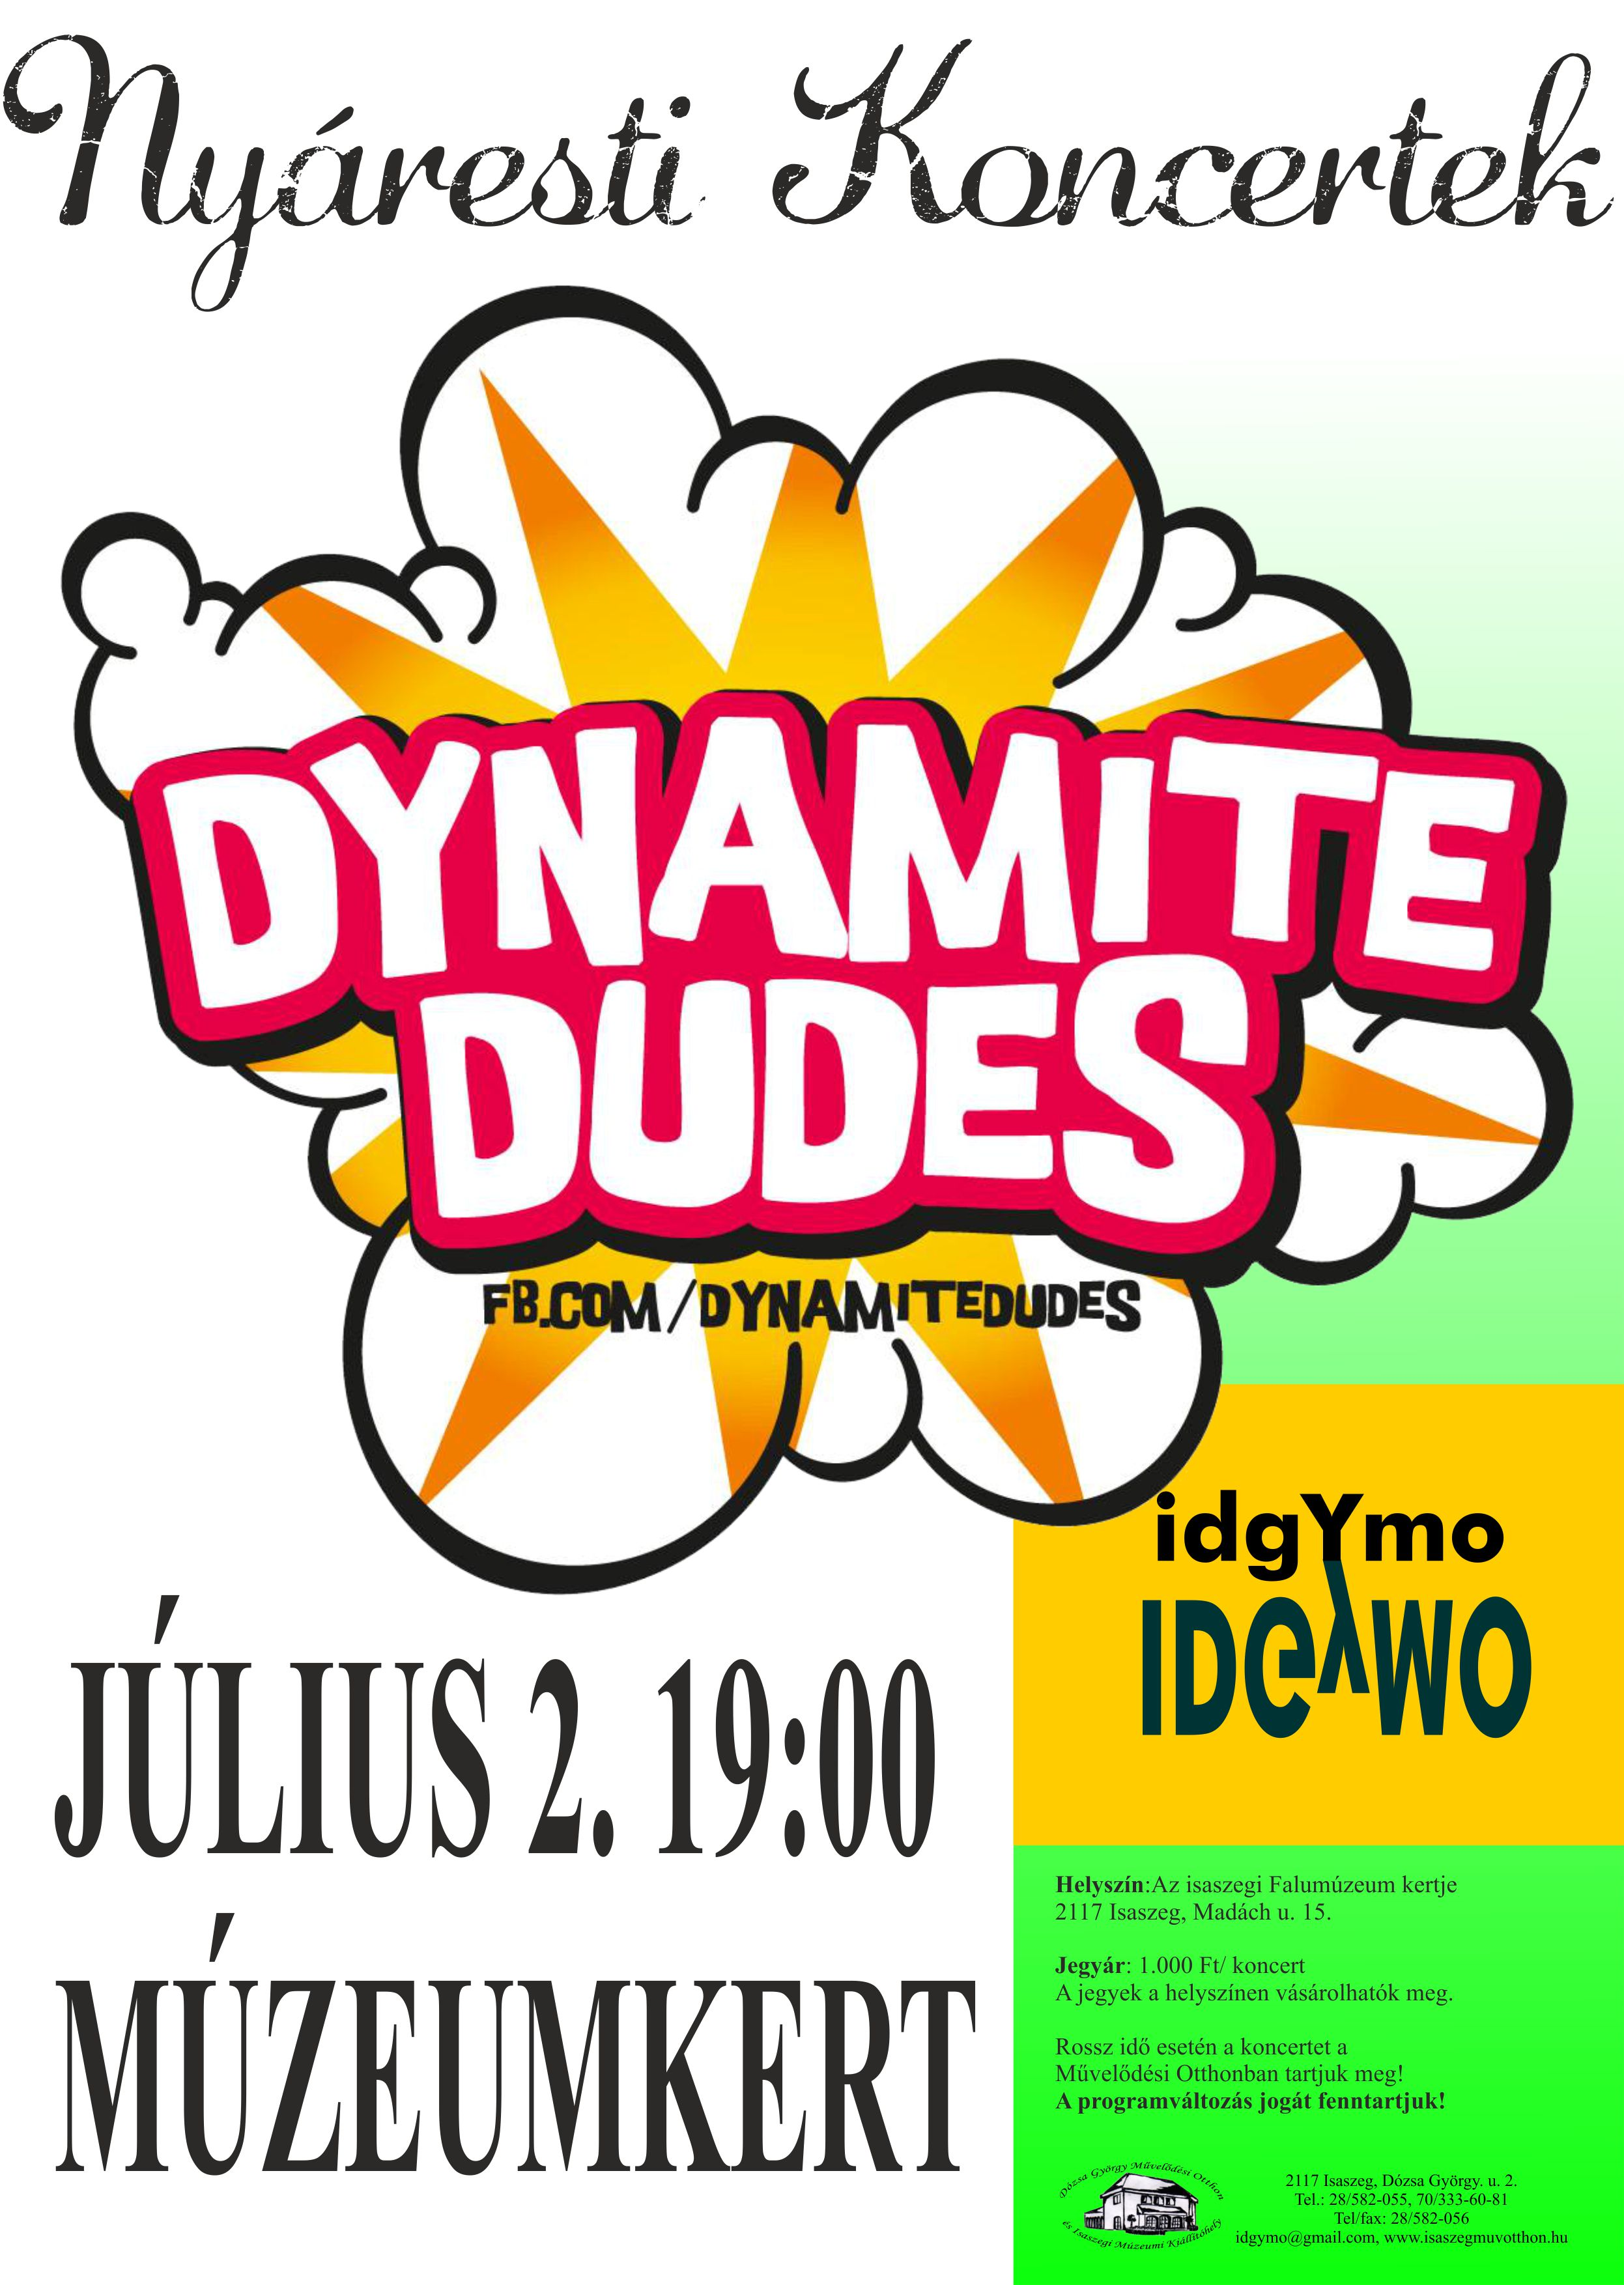 Dynamite Dudes